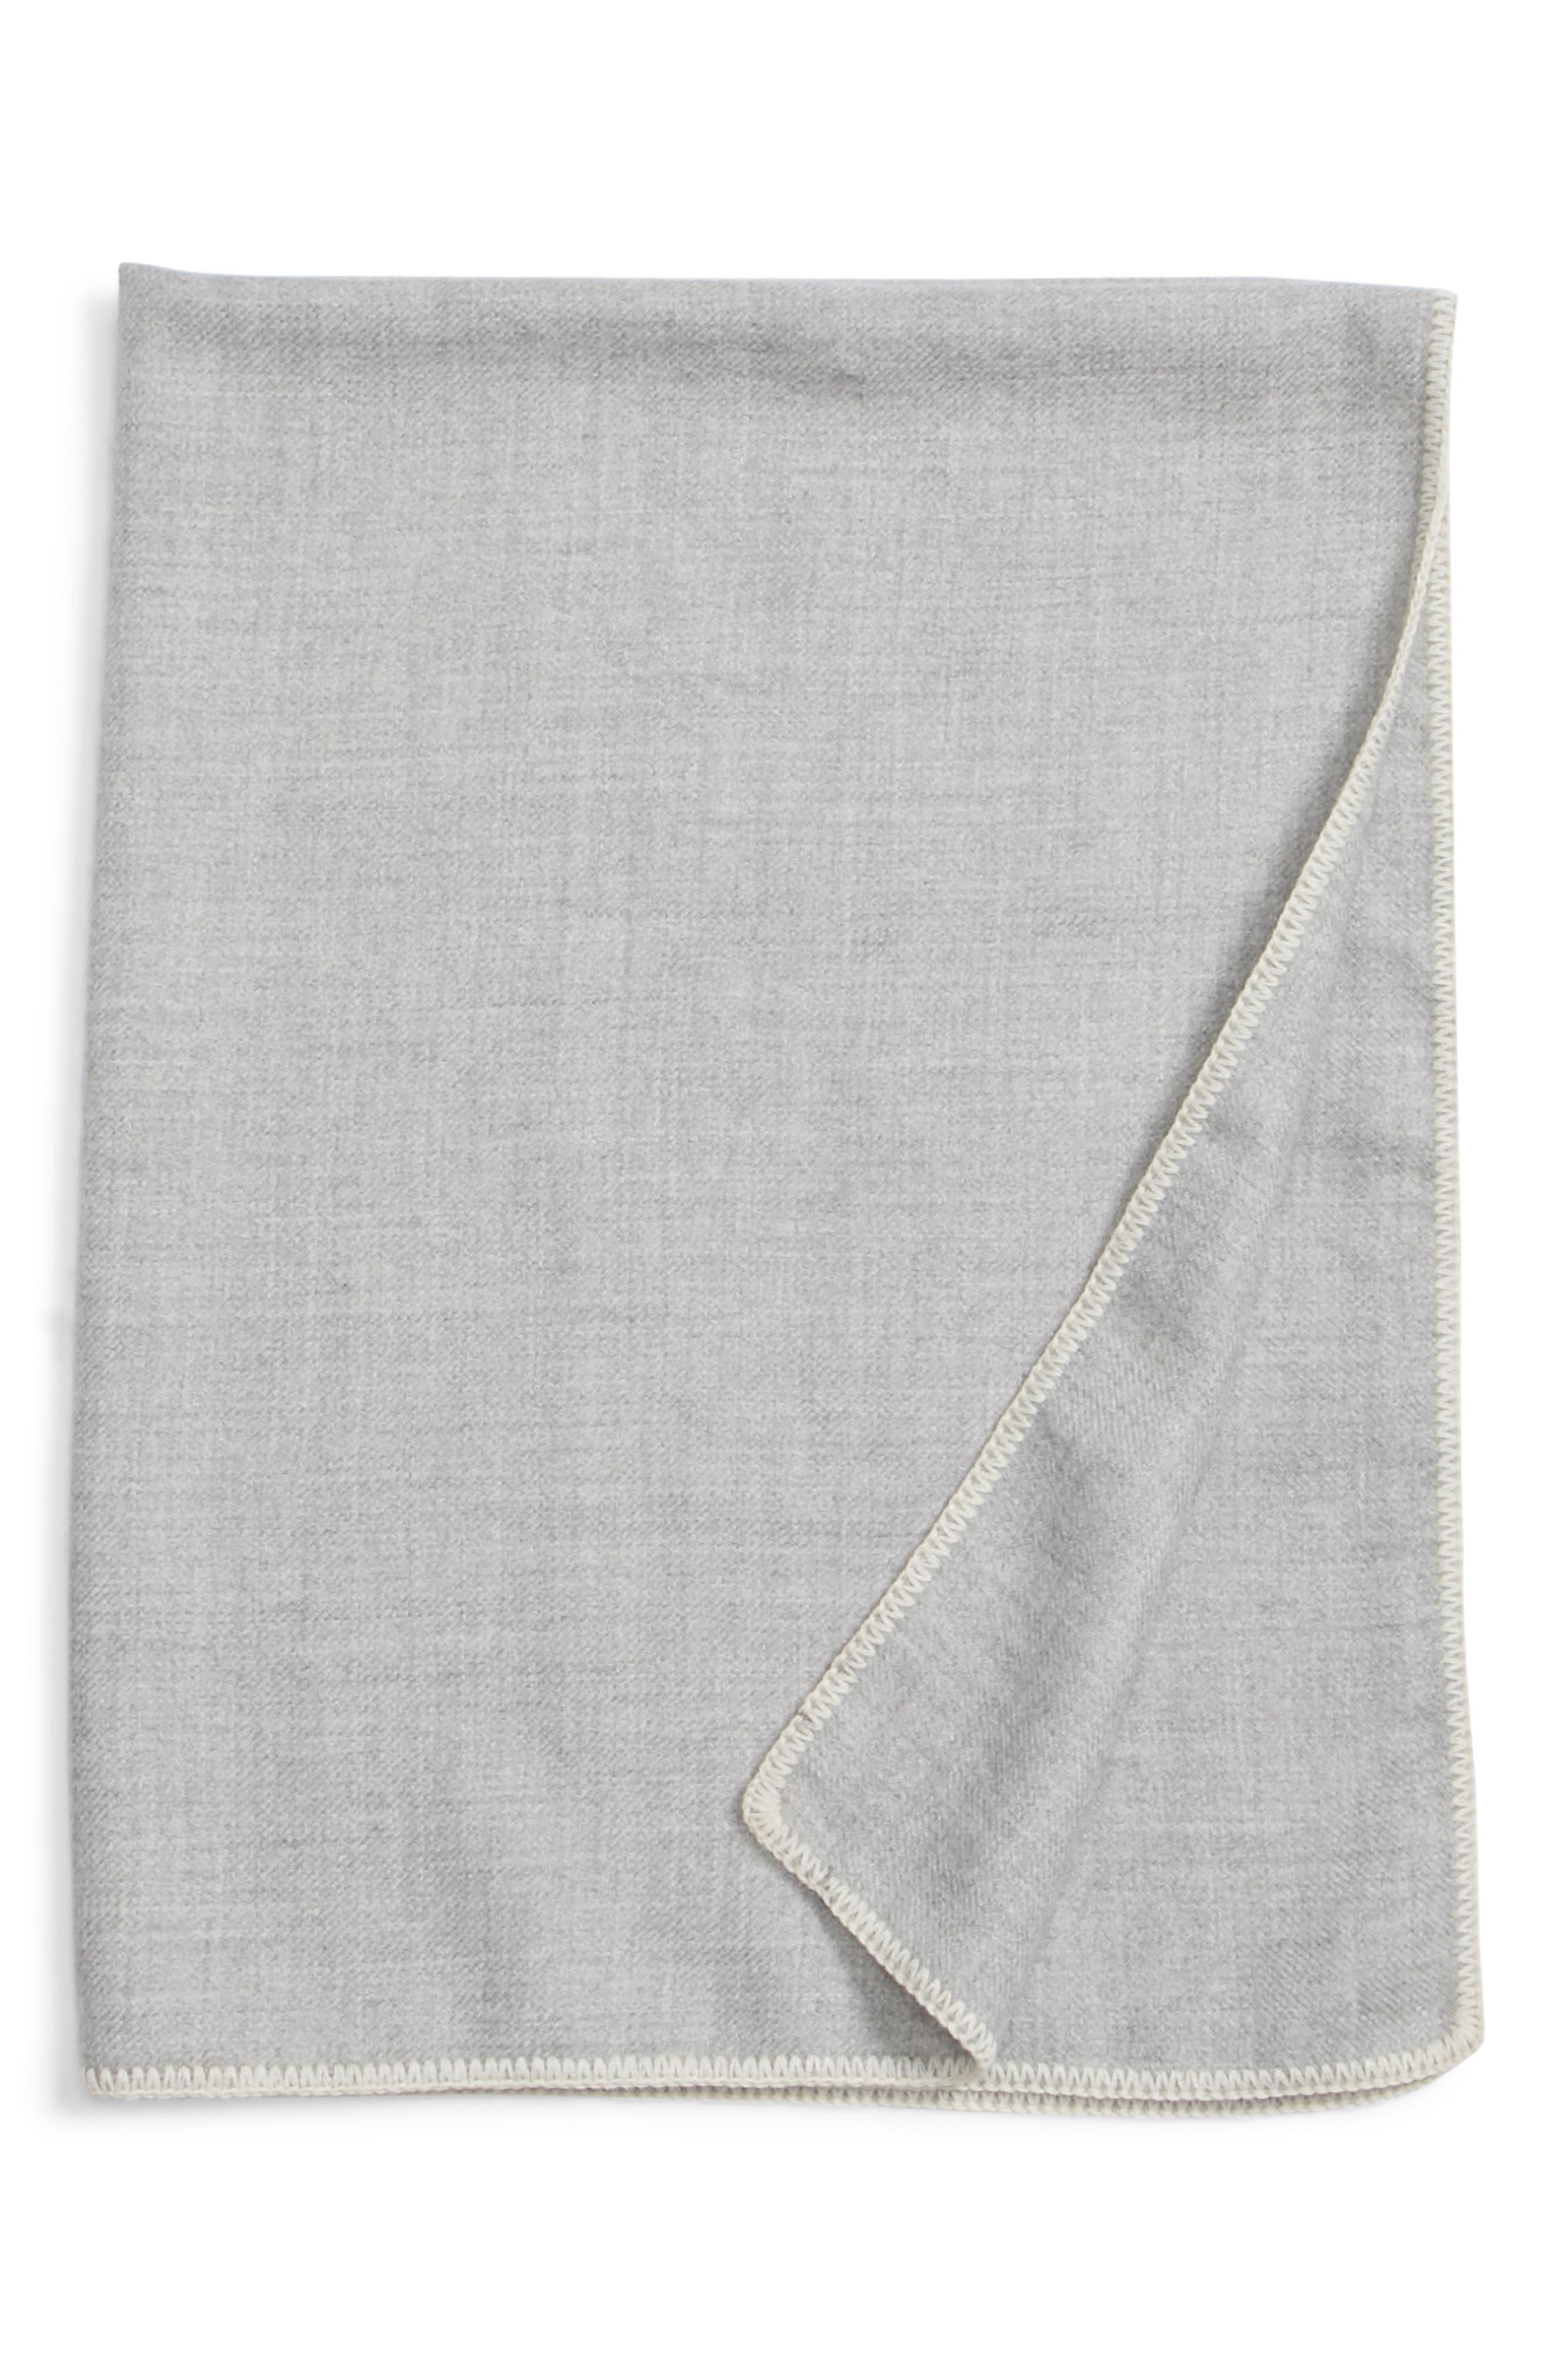 JENNI KAYNE Baby Blanket, Main, color, GREY/ IVORY